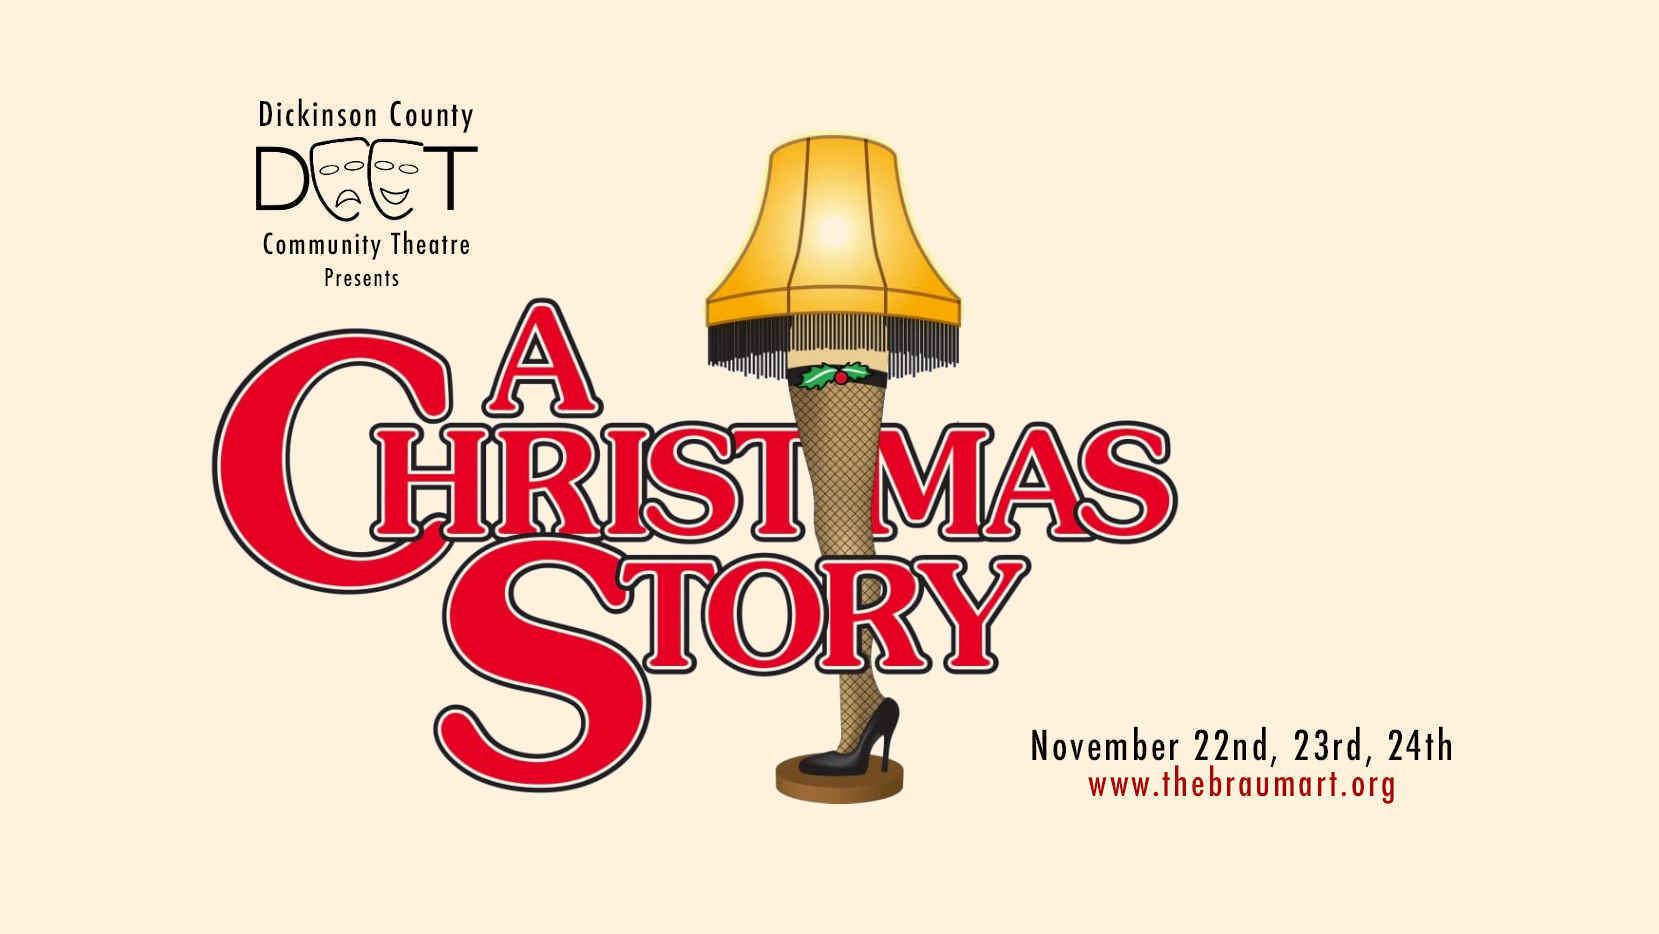 DCCT Presents A Christmas Story (November 22nd Evening) image